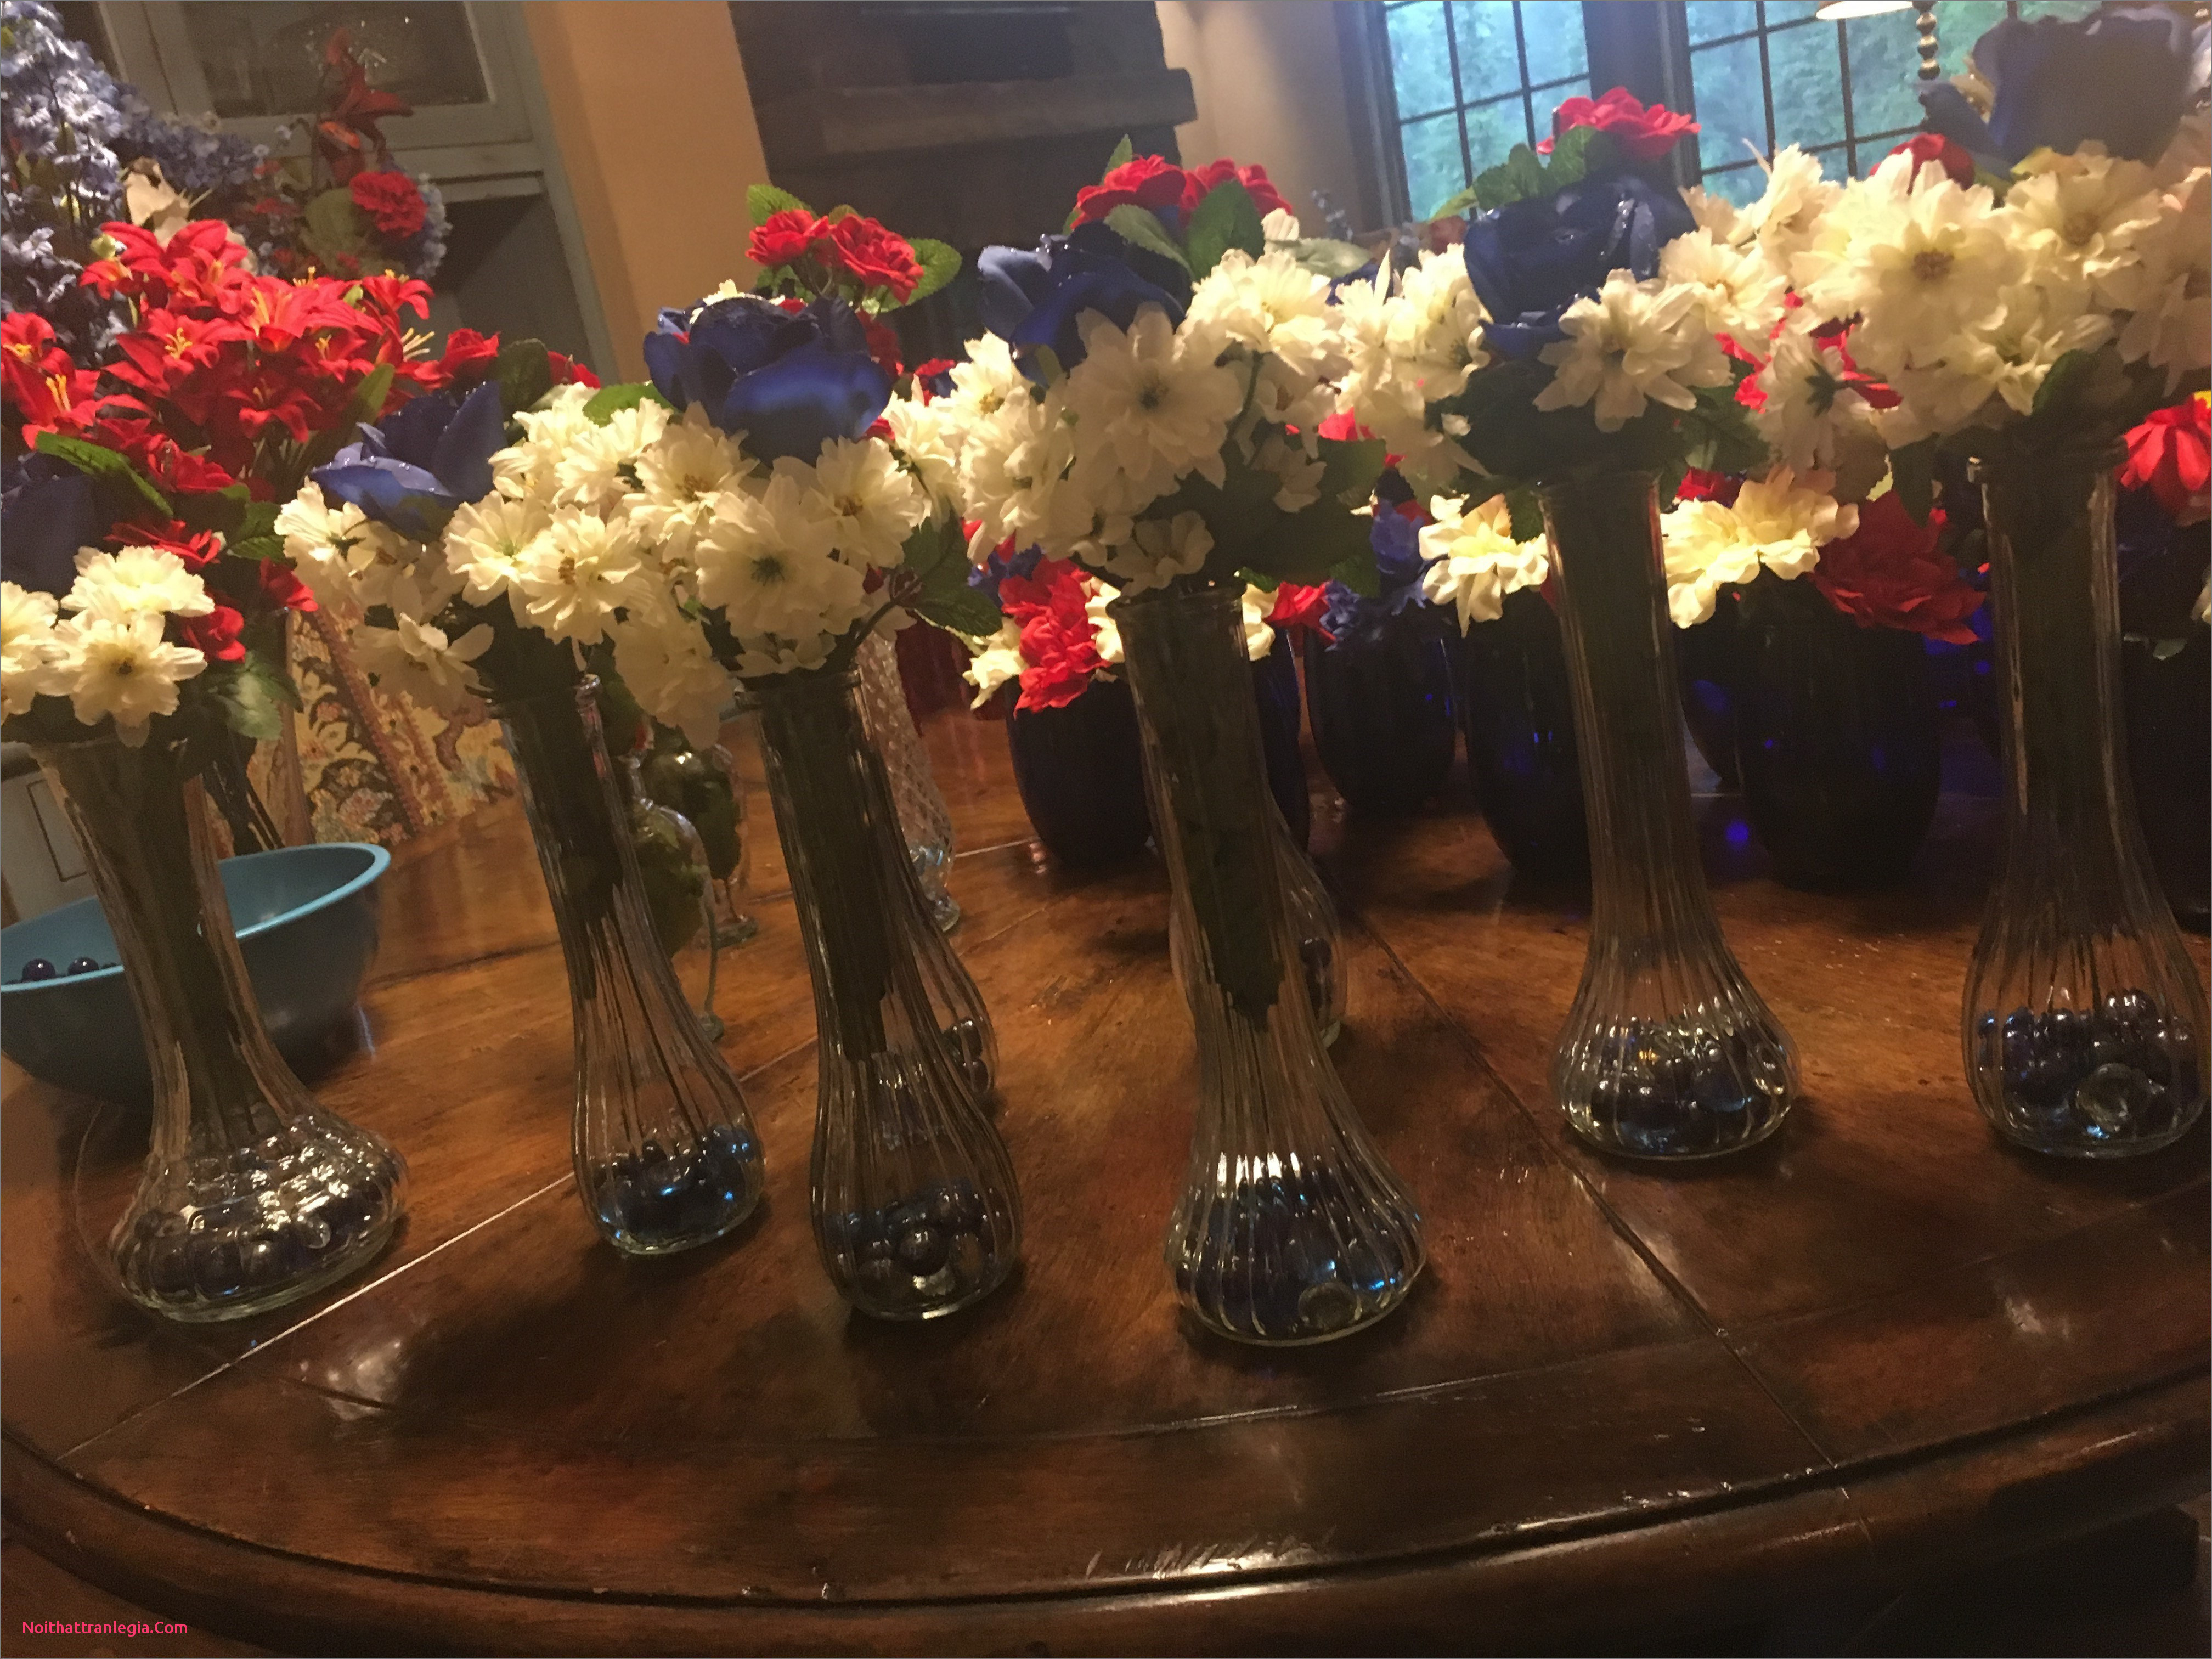 silk flowers in vases uk of 20 wedding vases noithattranlegia vases design throughout decoration line luxury dollar tree wedding decorations awesome h vases dollar vase i 0d